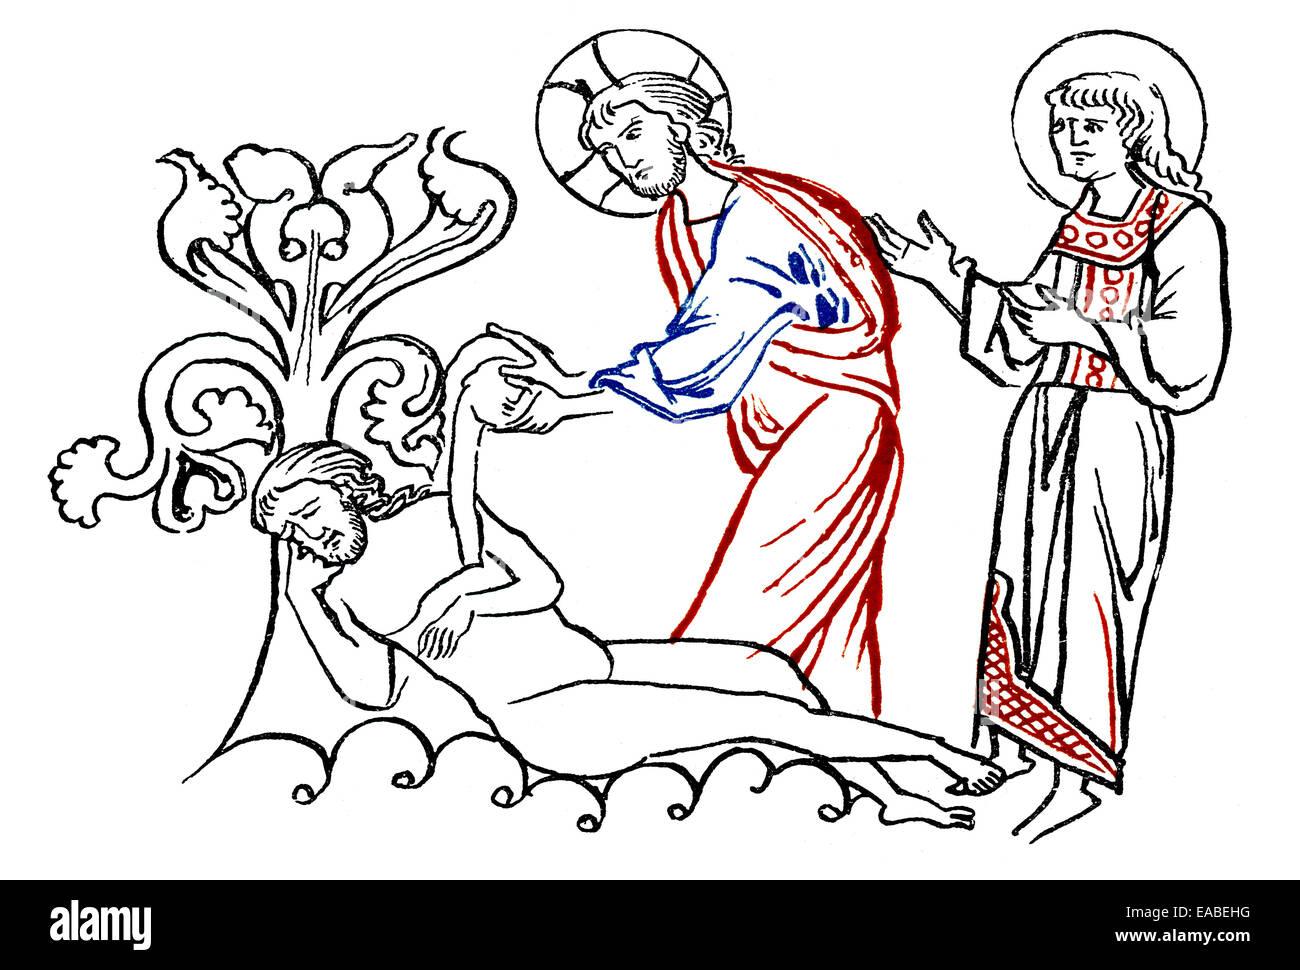 Historic print, The Creation of Eve, Millstaett Manuscript, an illustrated manuscript written in southern Bavarian - Stock Image